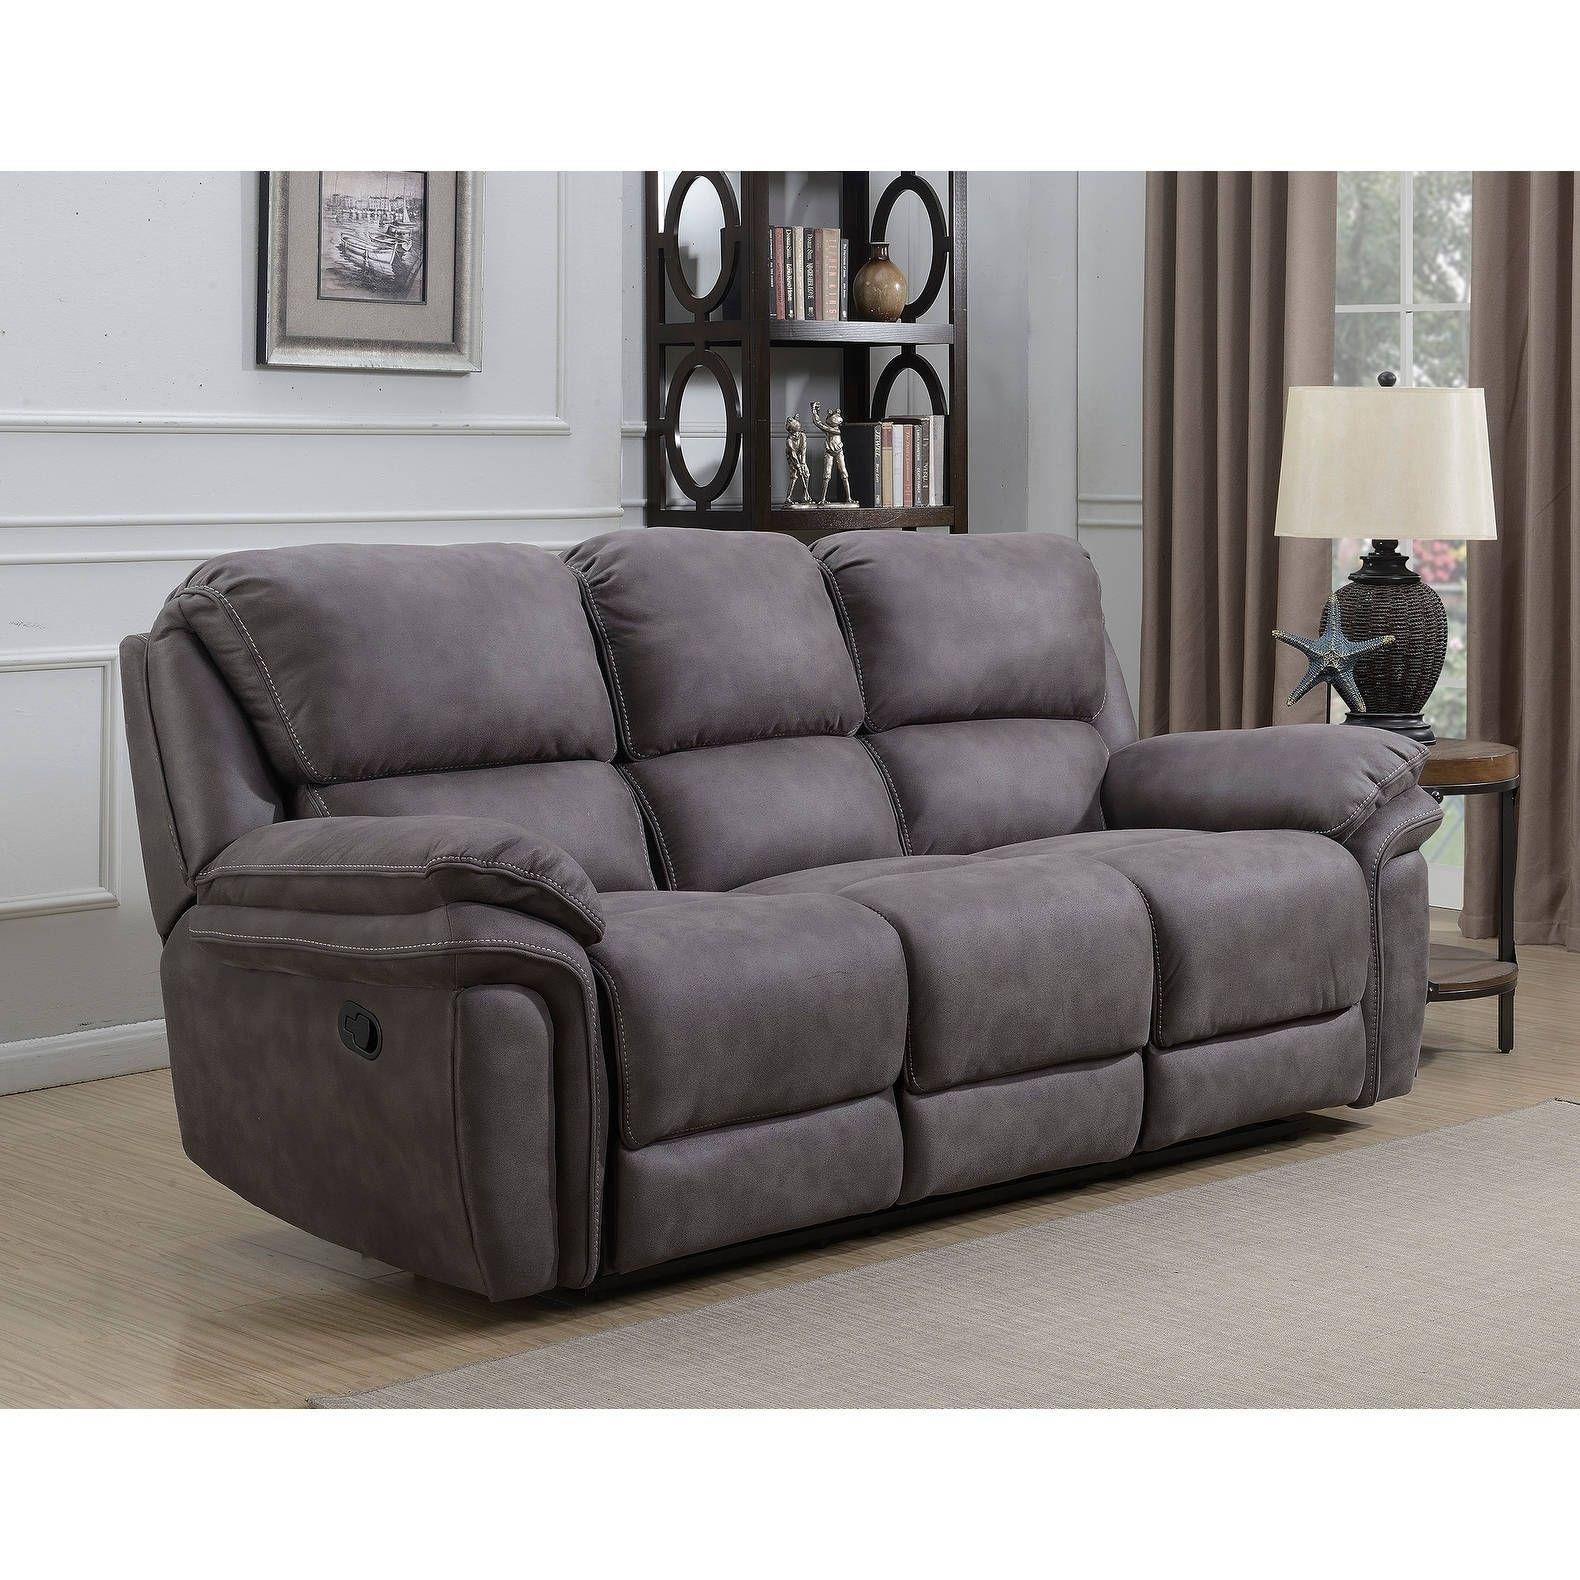 Henry Dual Lay Flat Grey Fabric Reclining Sofa with Memory Foam Seat ...